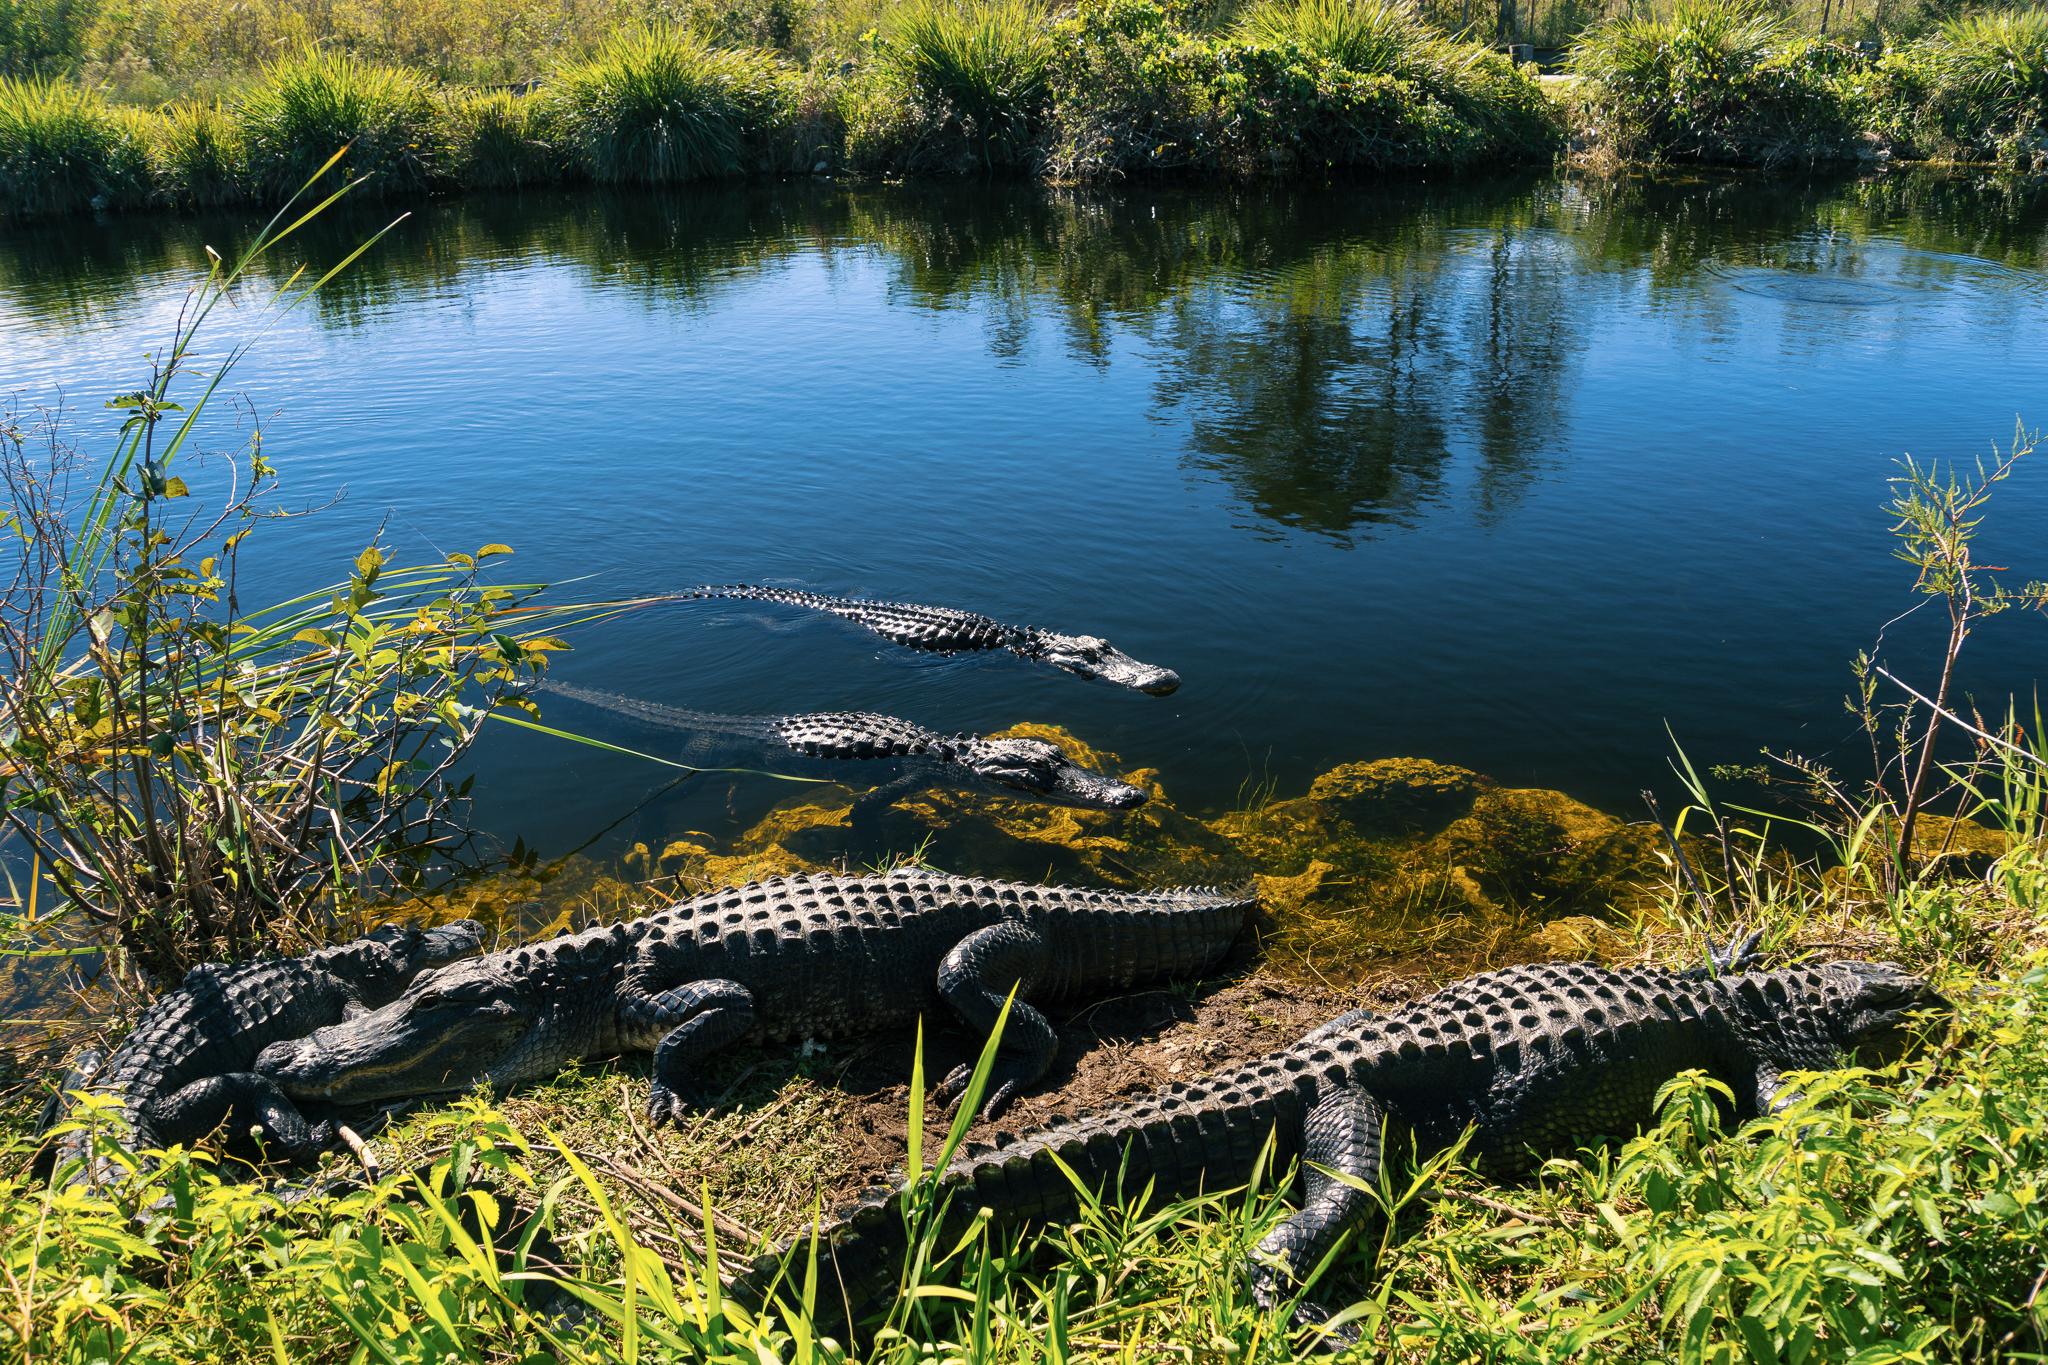 Best hikes in Everglades